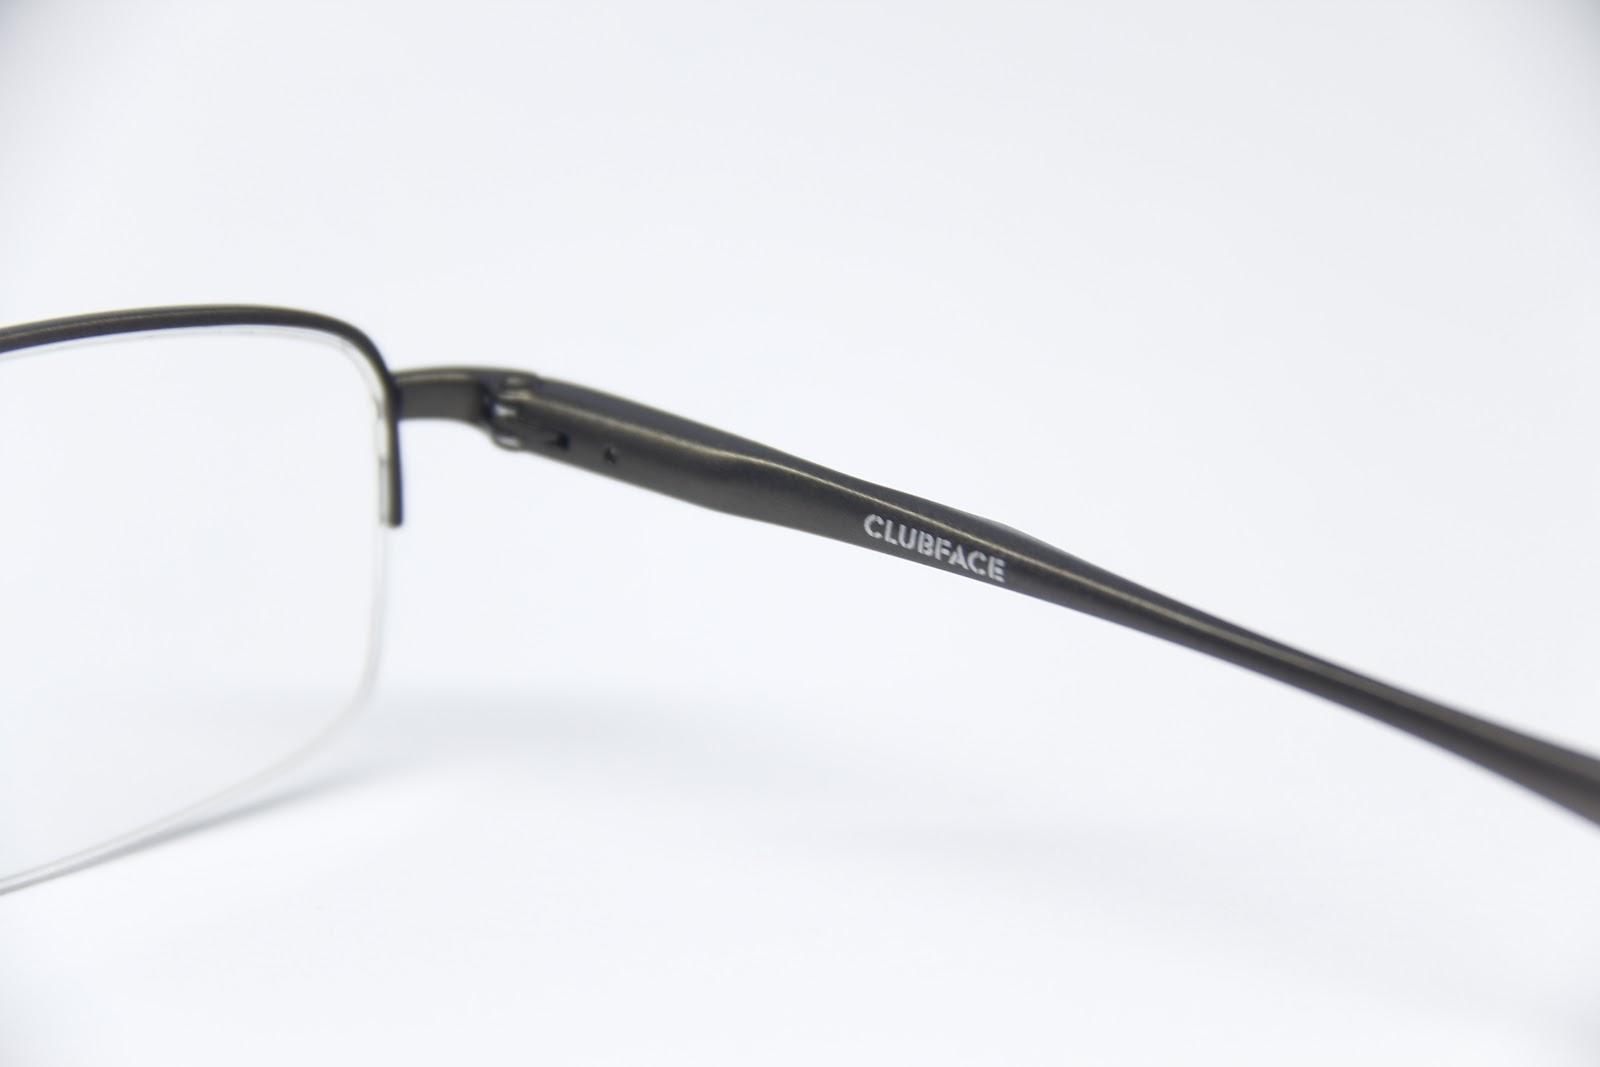 7b067406bf Oakley Prescription Glasses Singapore  Oakley CLUBFACE